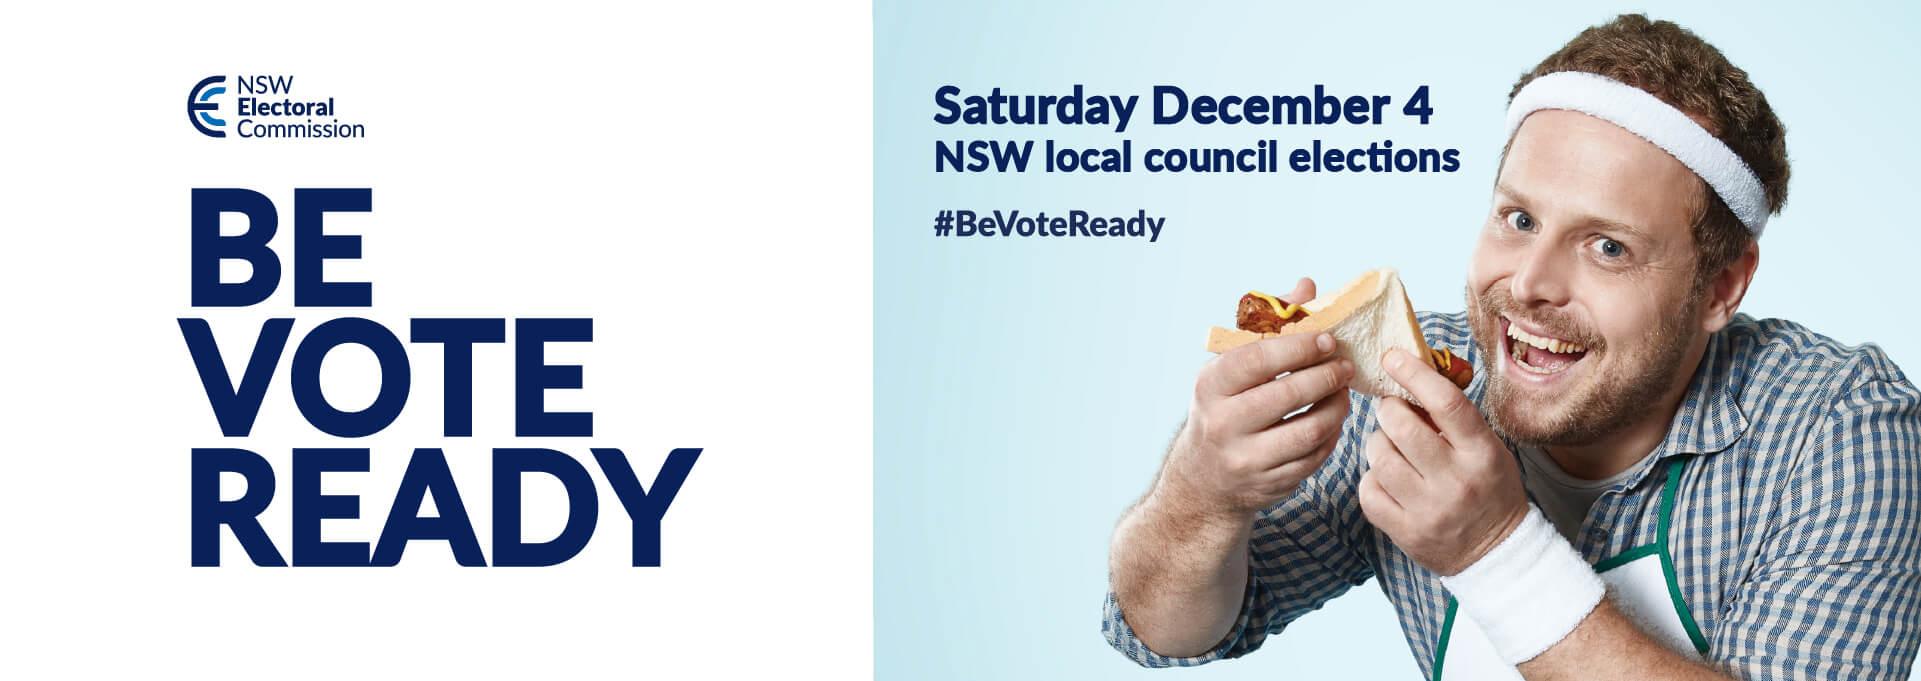 Be Vote Ready